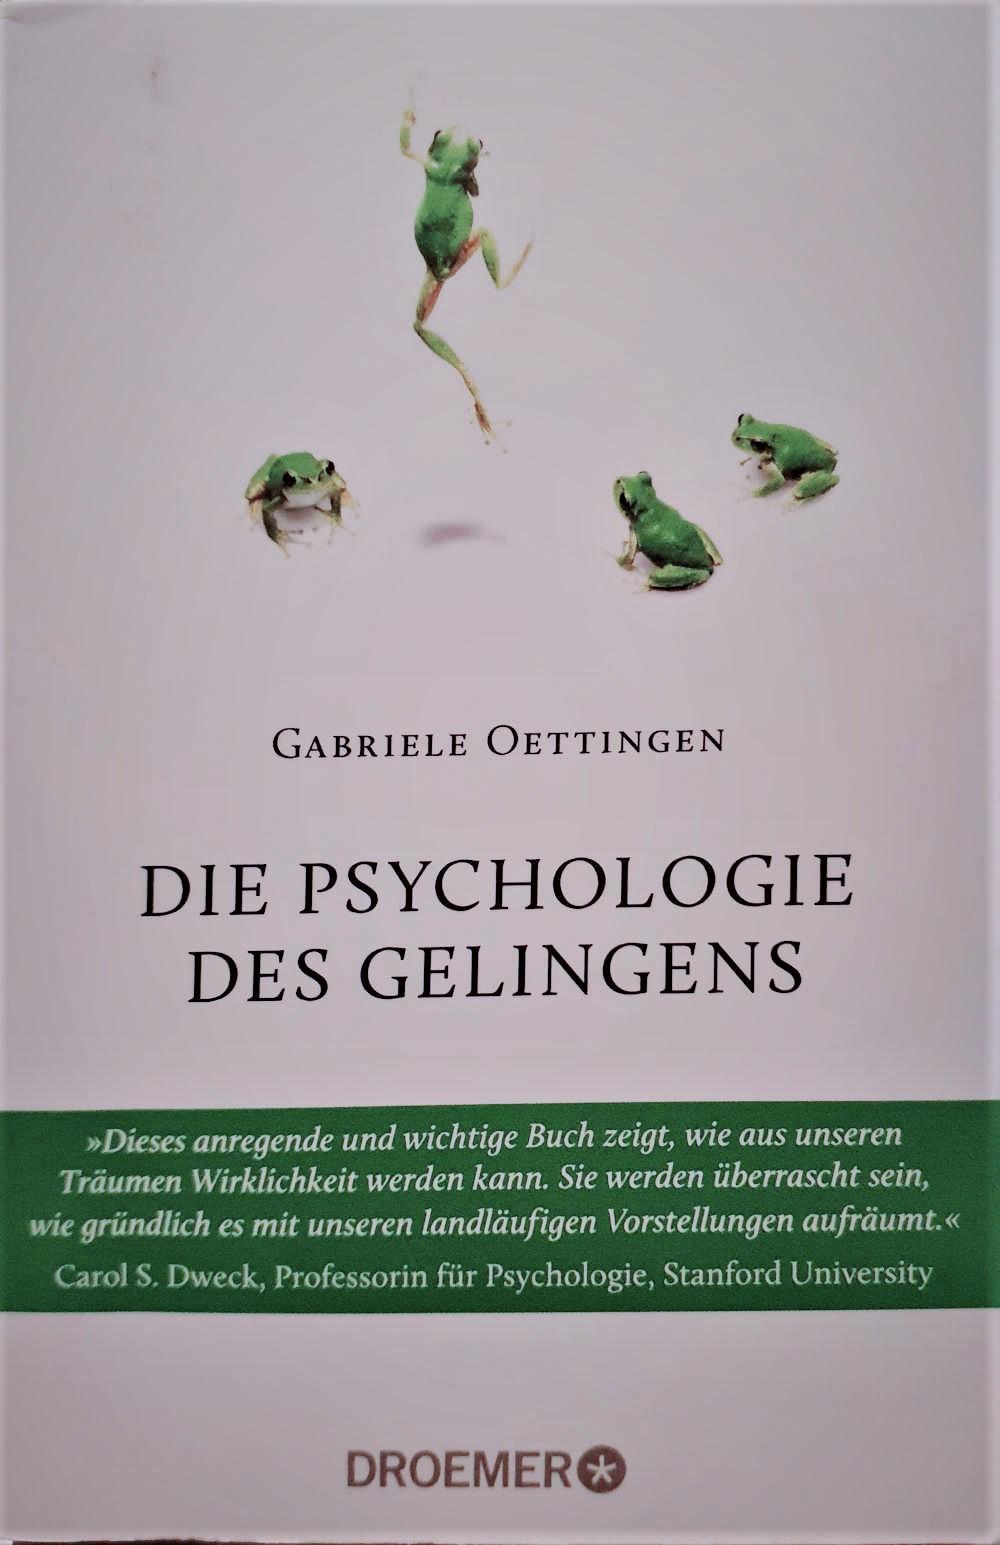 Die Psychologie des Gelingens